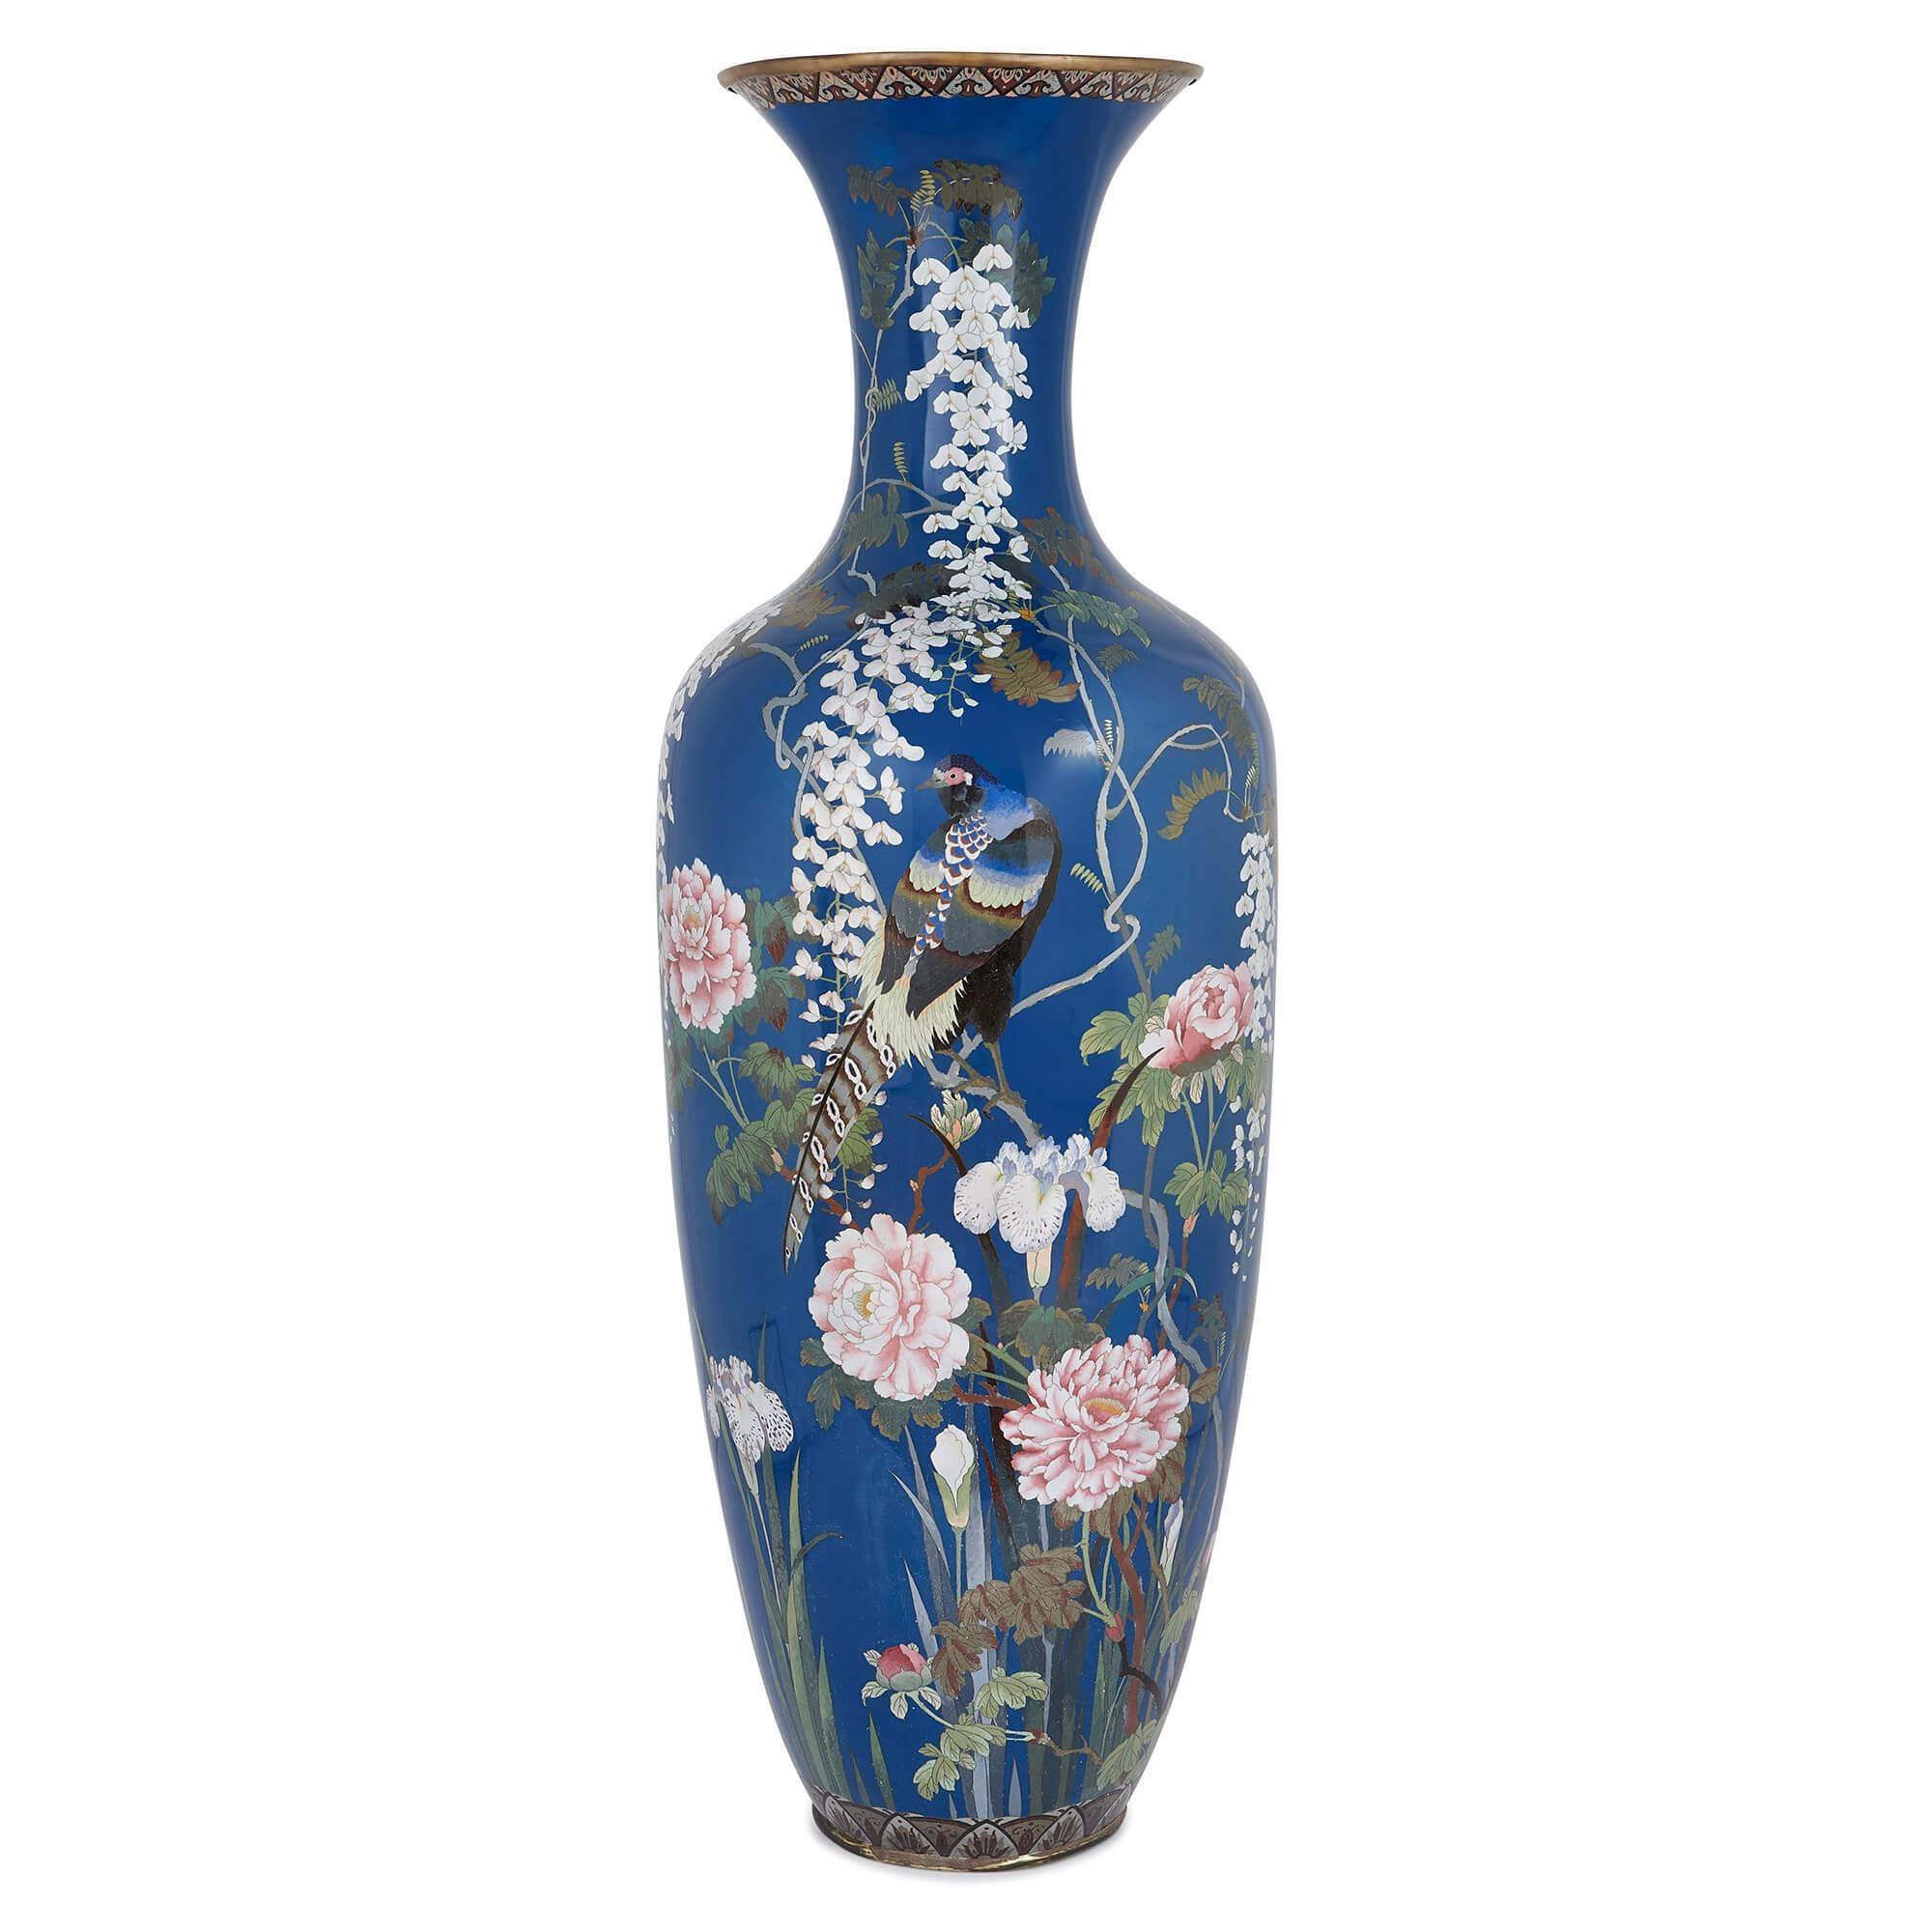 Very Large Japanese Meiji Period Cloisonne Enamel Vase